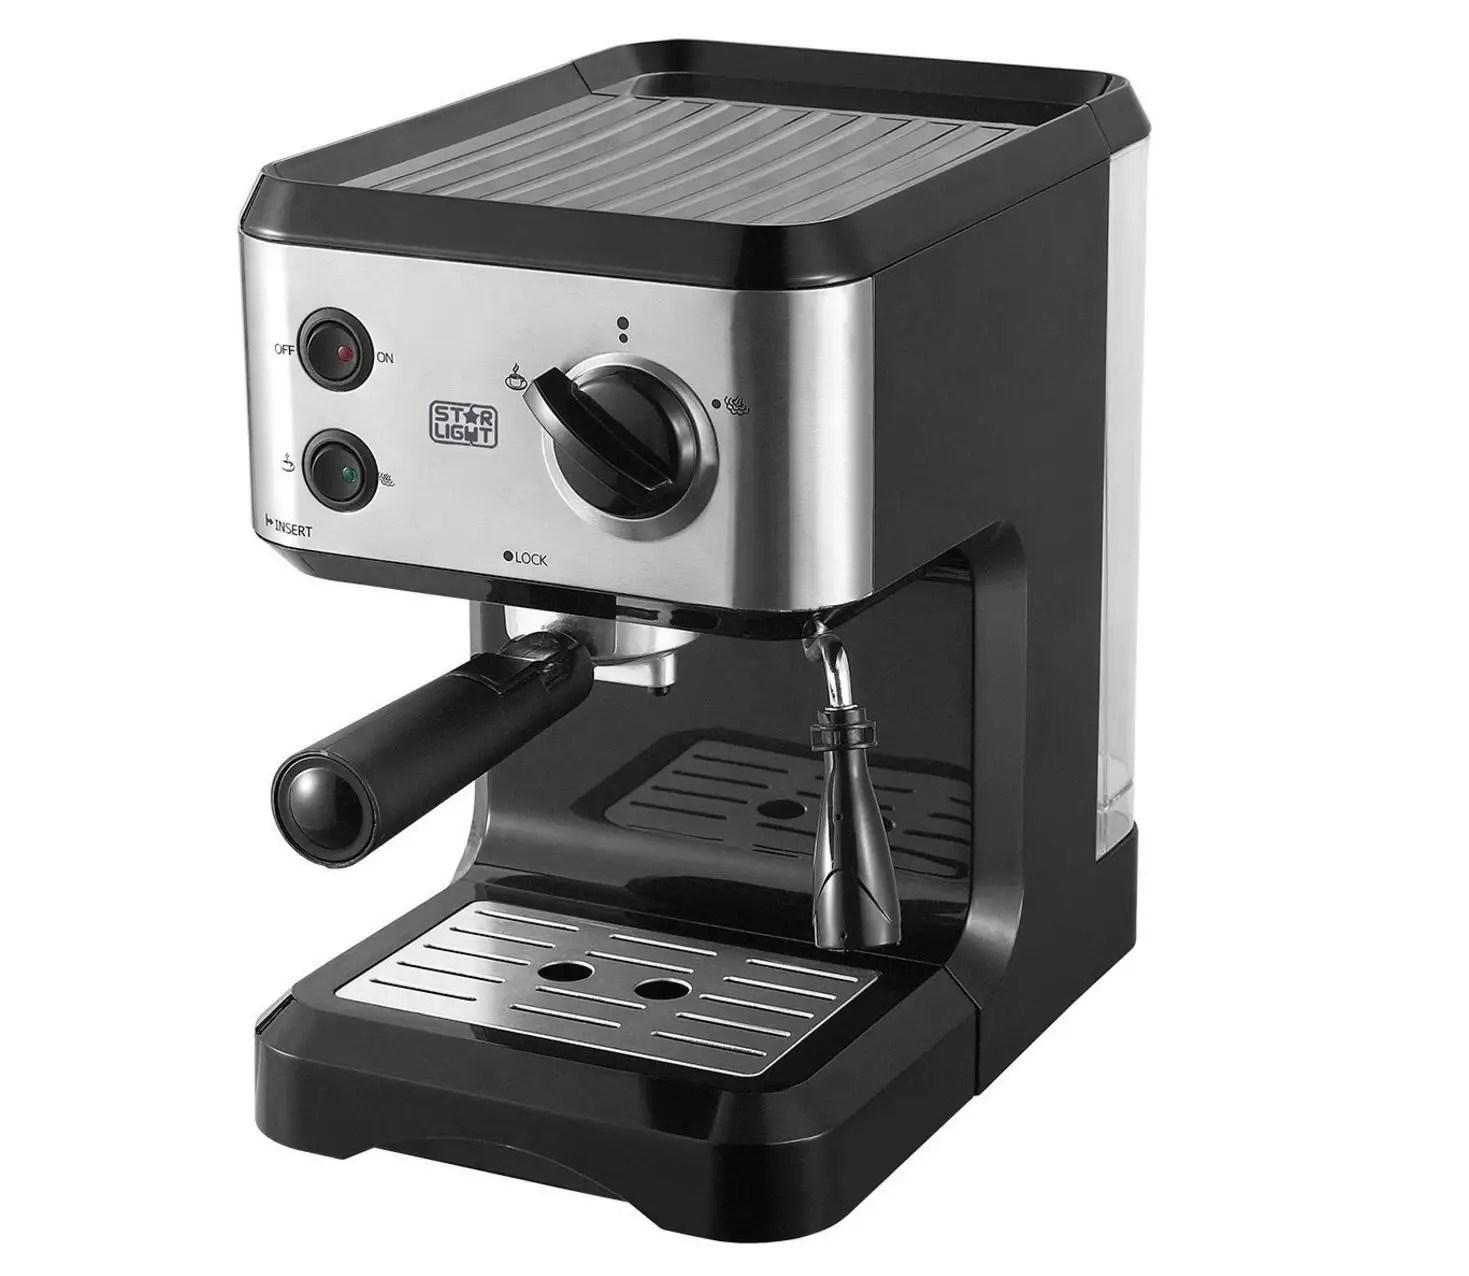 lichidare de stoc la espressoare si cafetiere. Black Bedroom Furniture Sets. Home Design Ideas